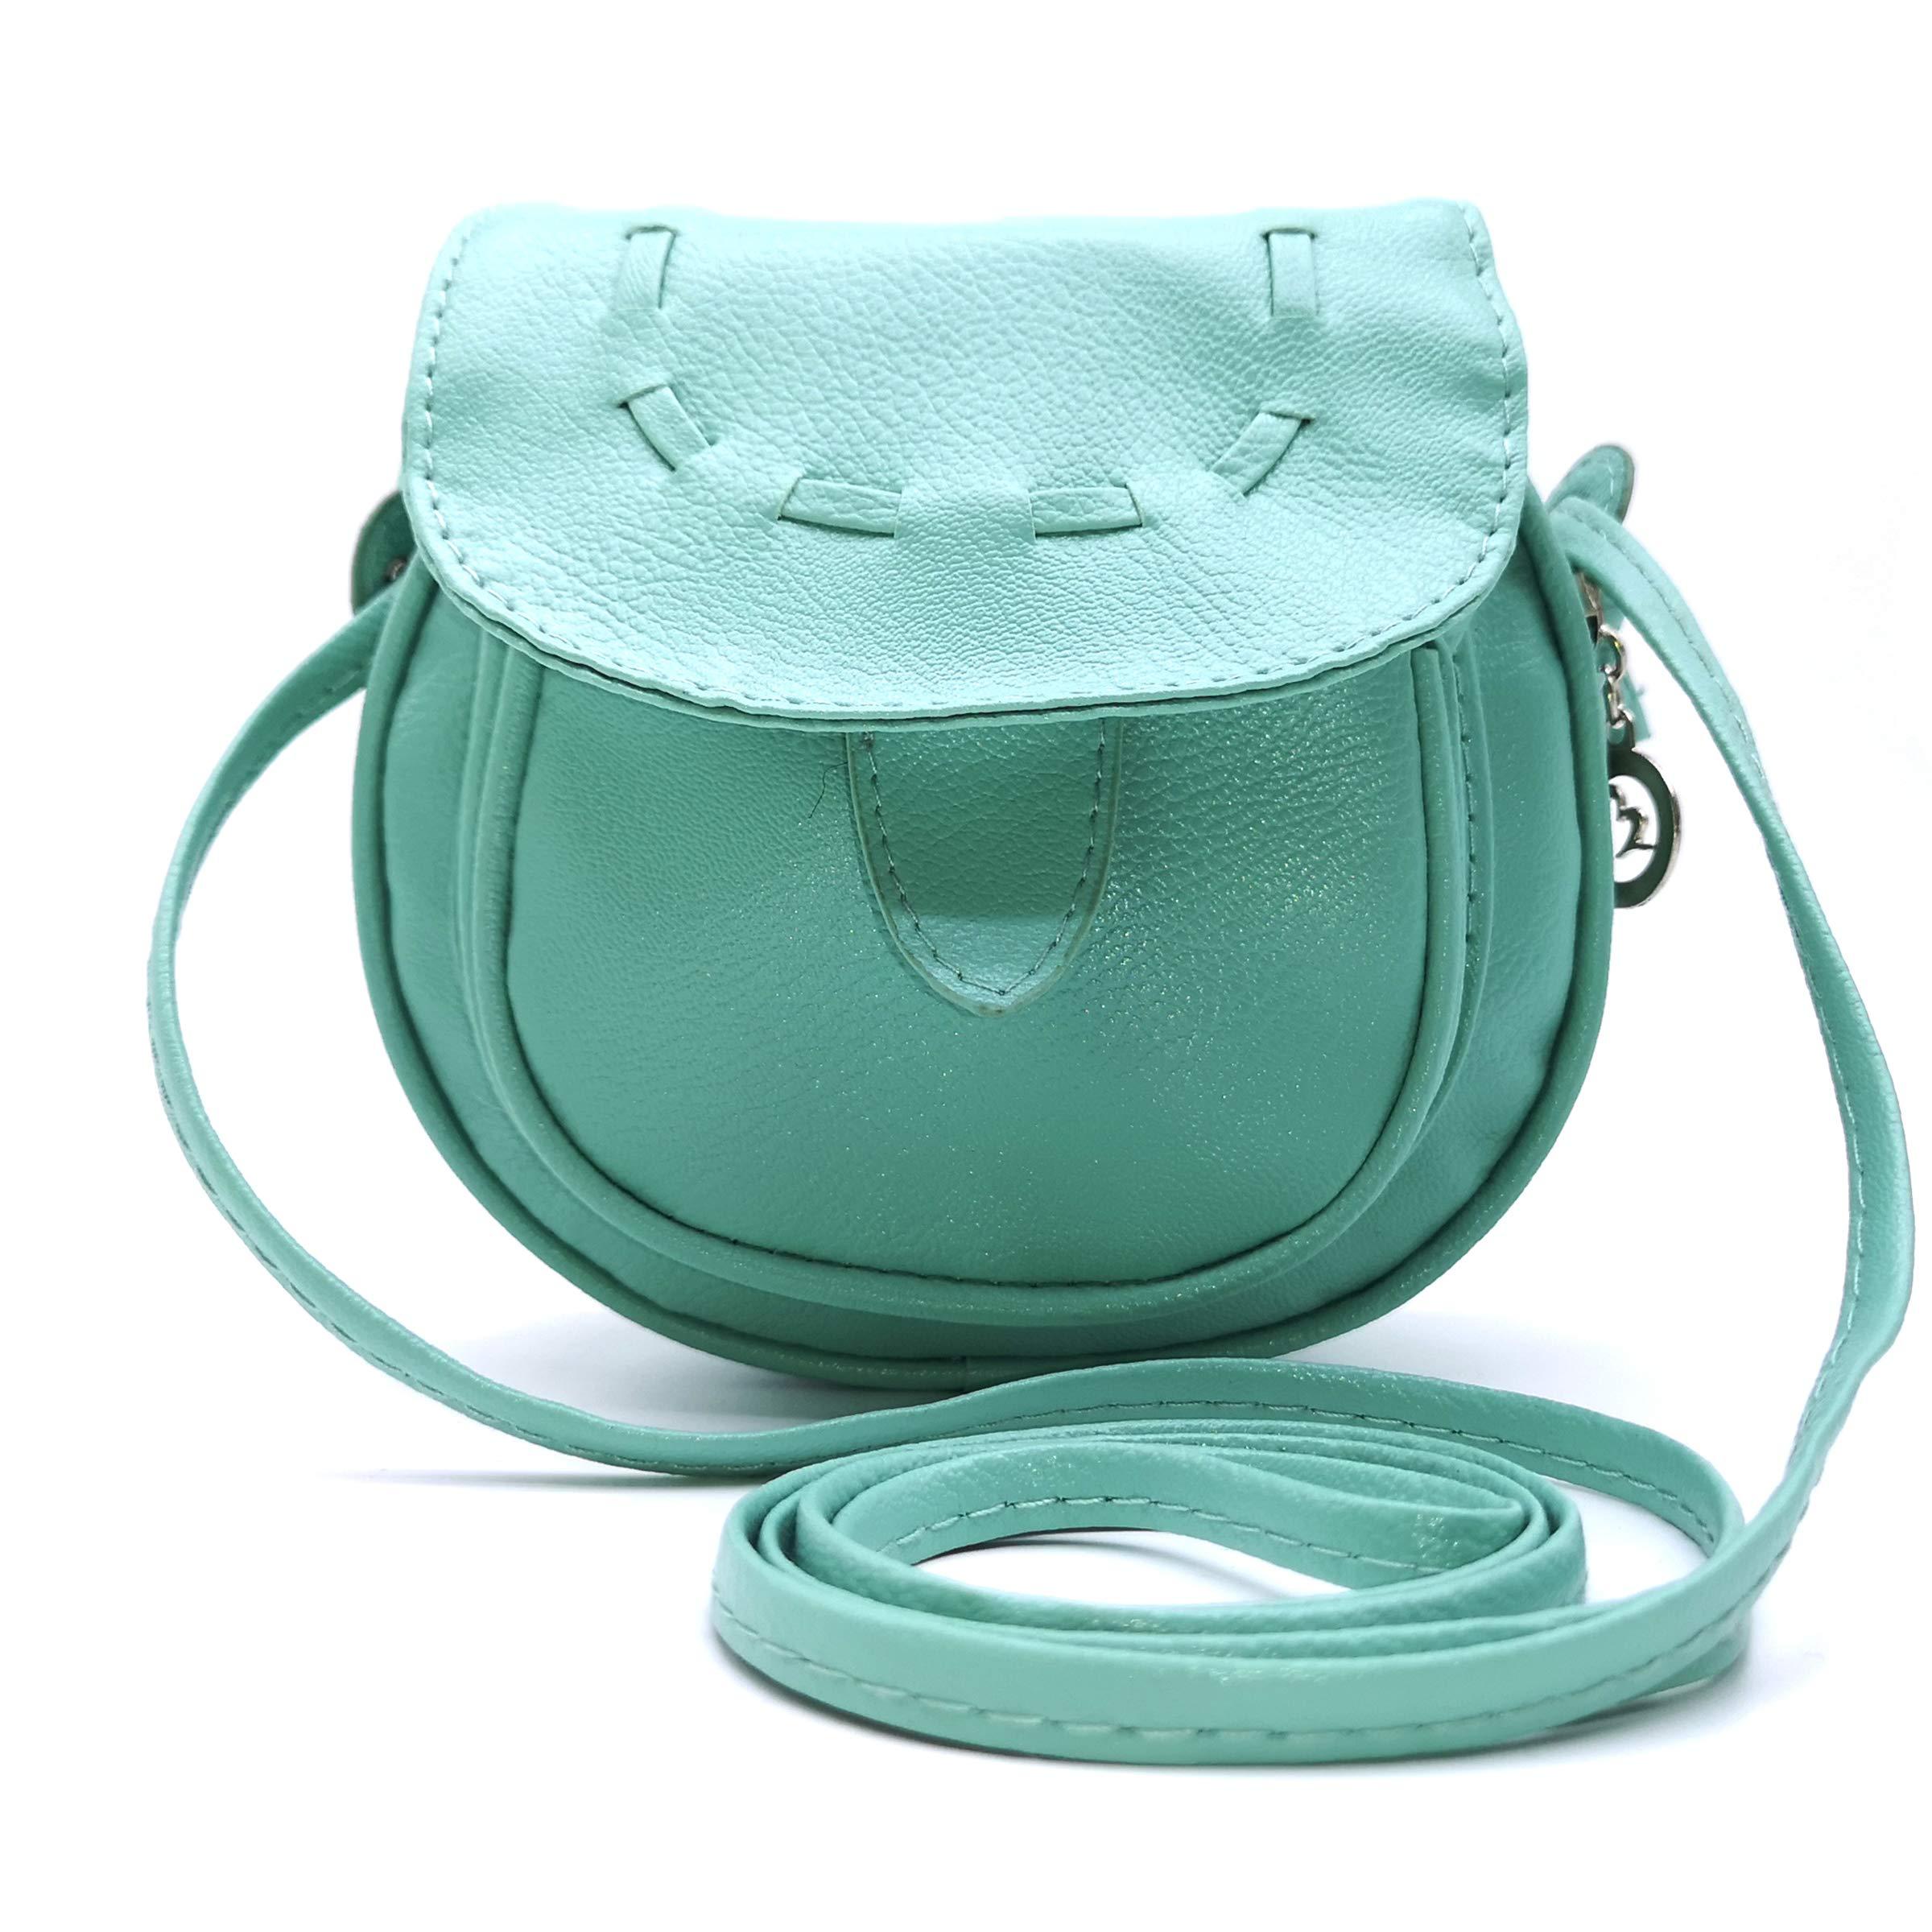 ZENTEII Little Girl's Synthetic Leather Mini Shoulder Bag